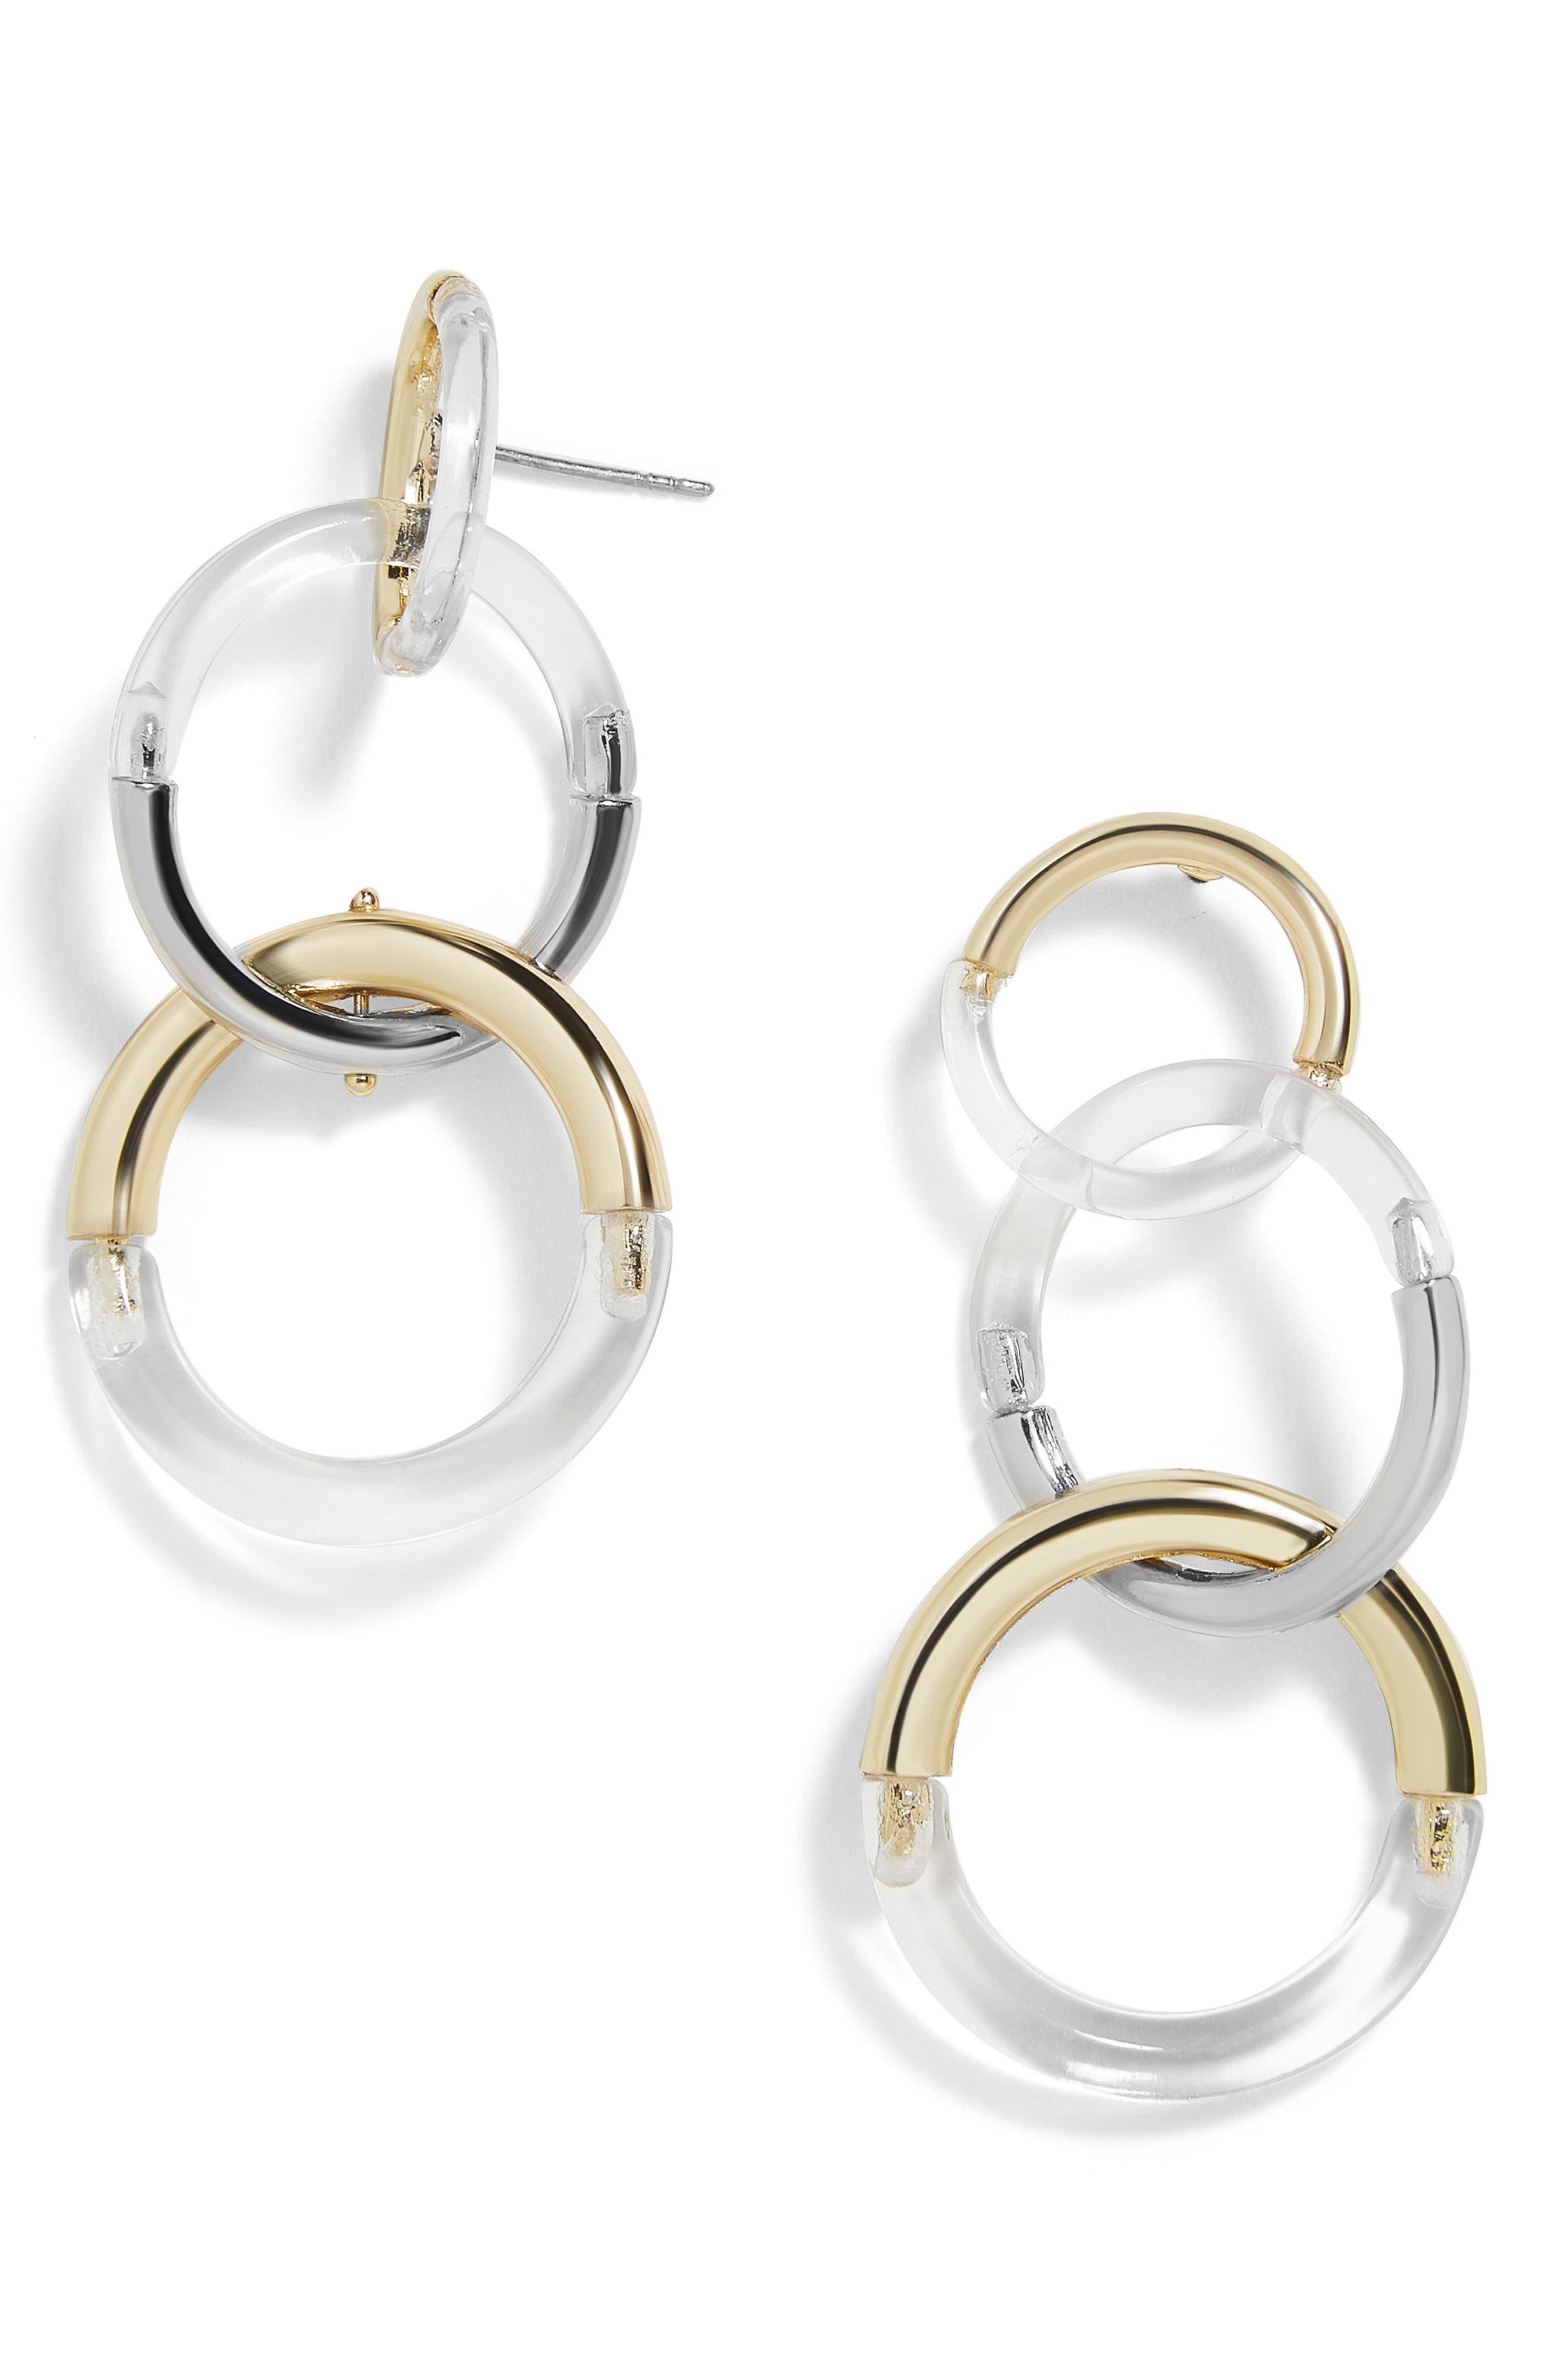 Lova Drop Earrings,                             Main thumbnail 1, color,                             GOLD